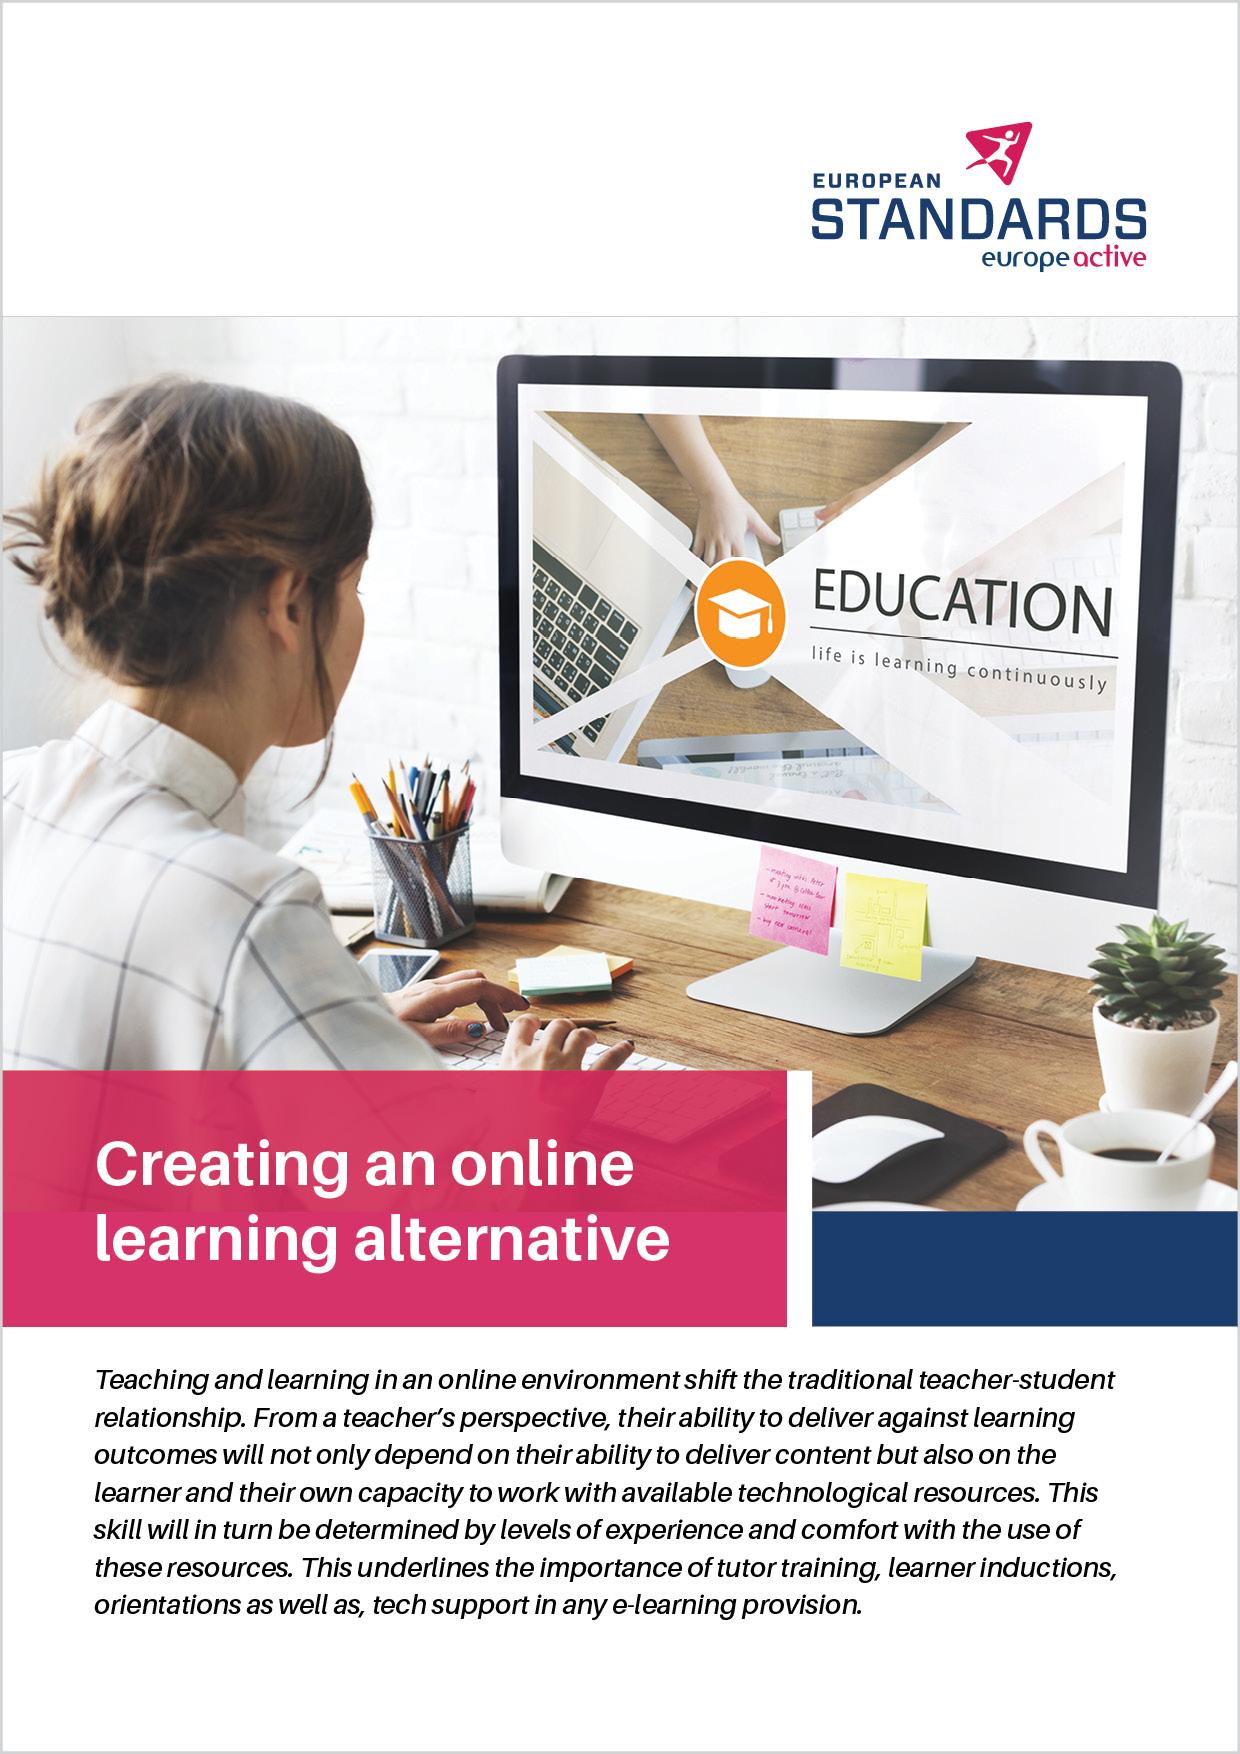 EREPS - digital online learning